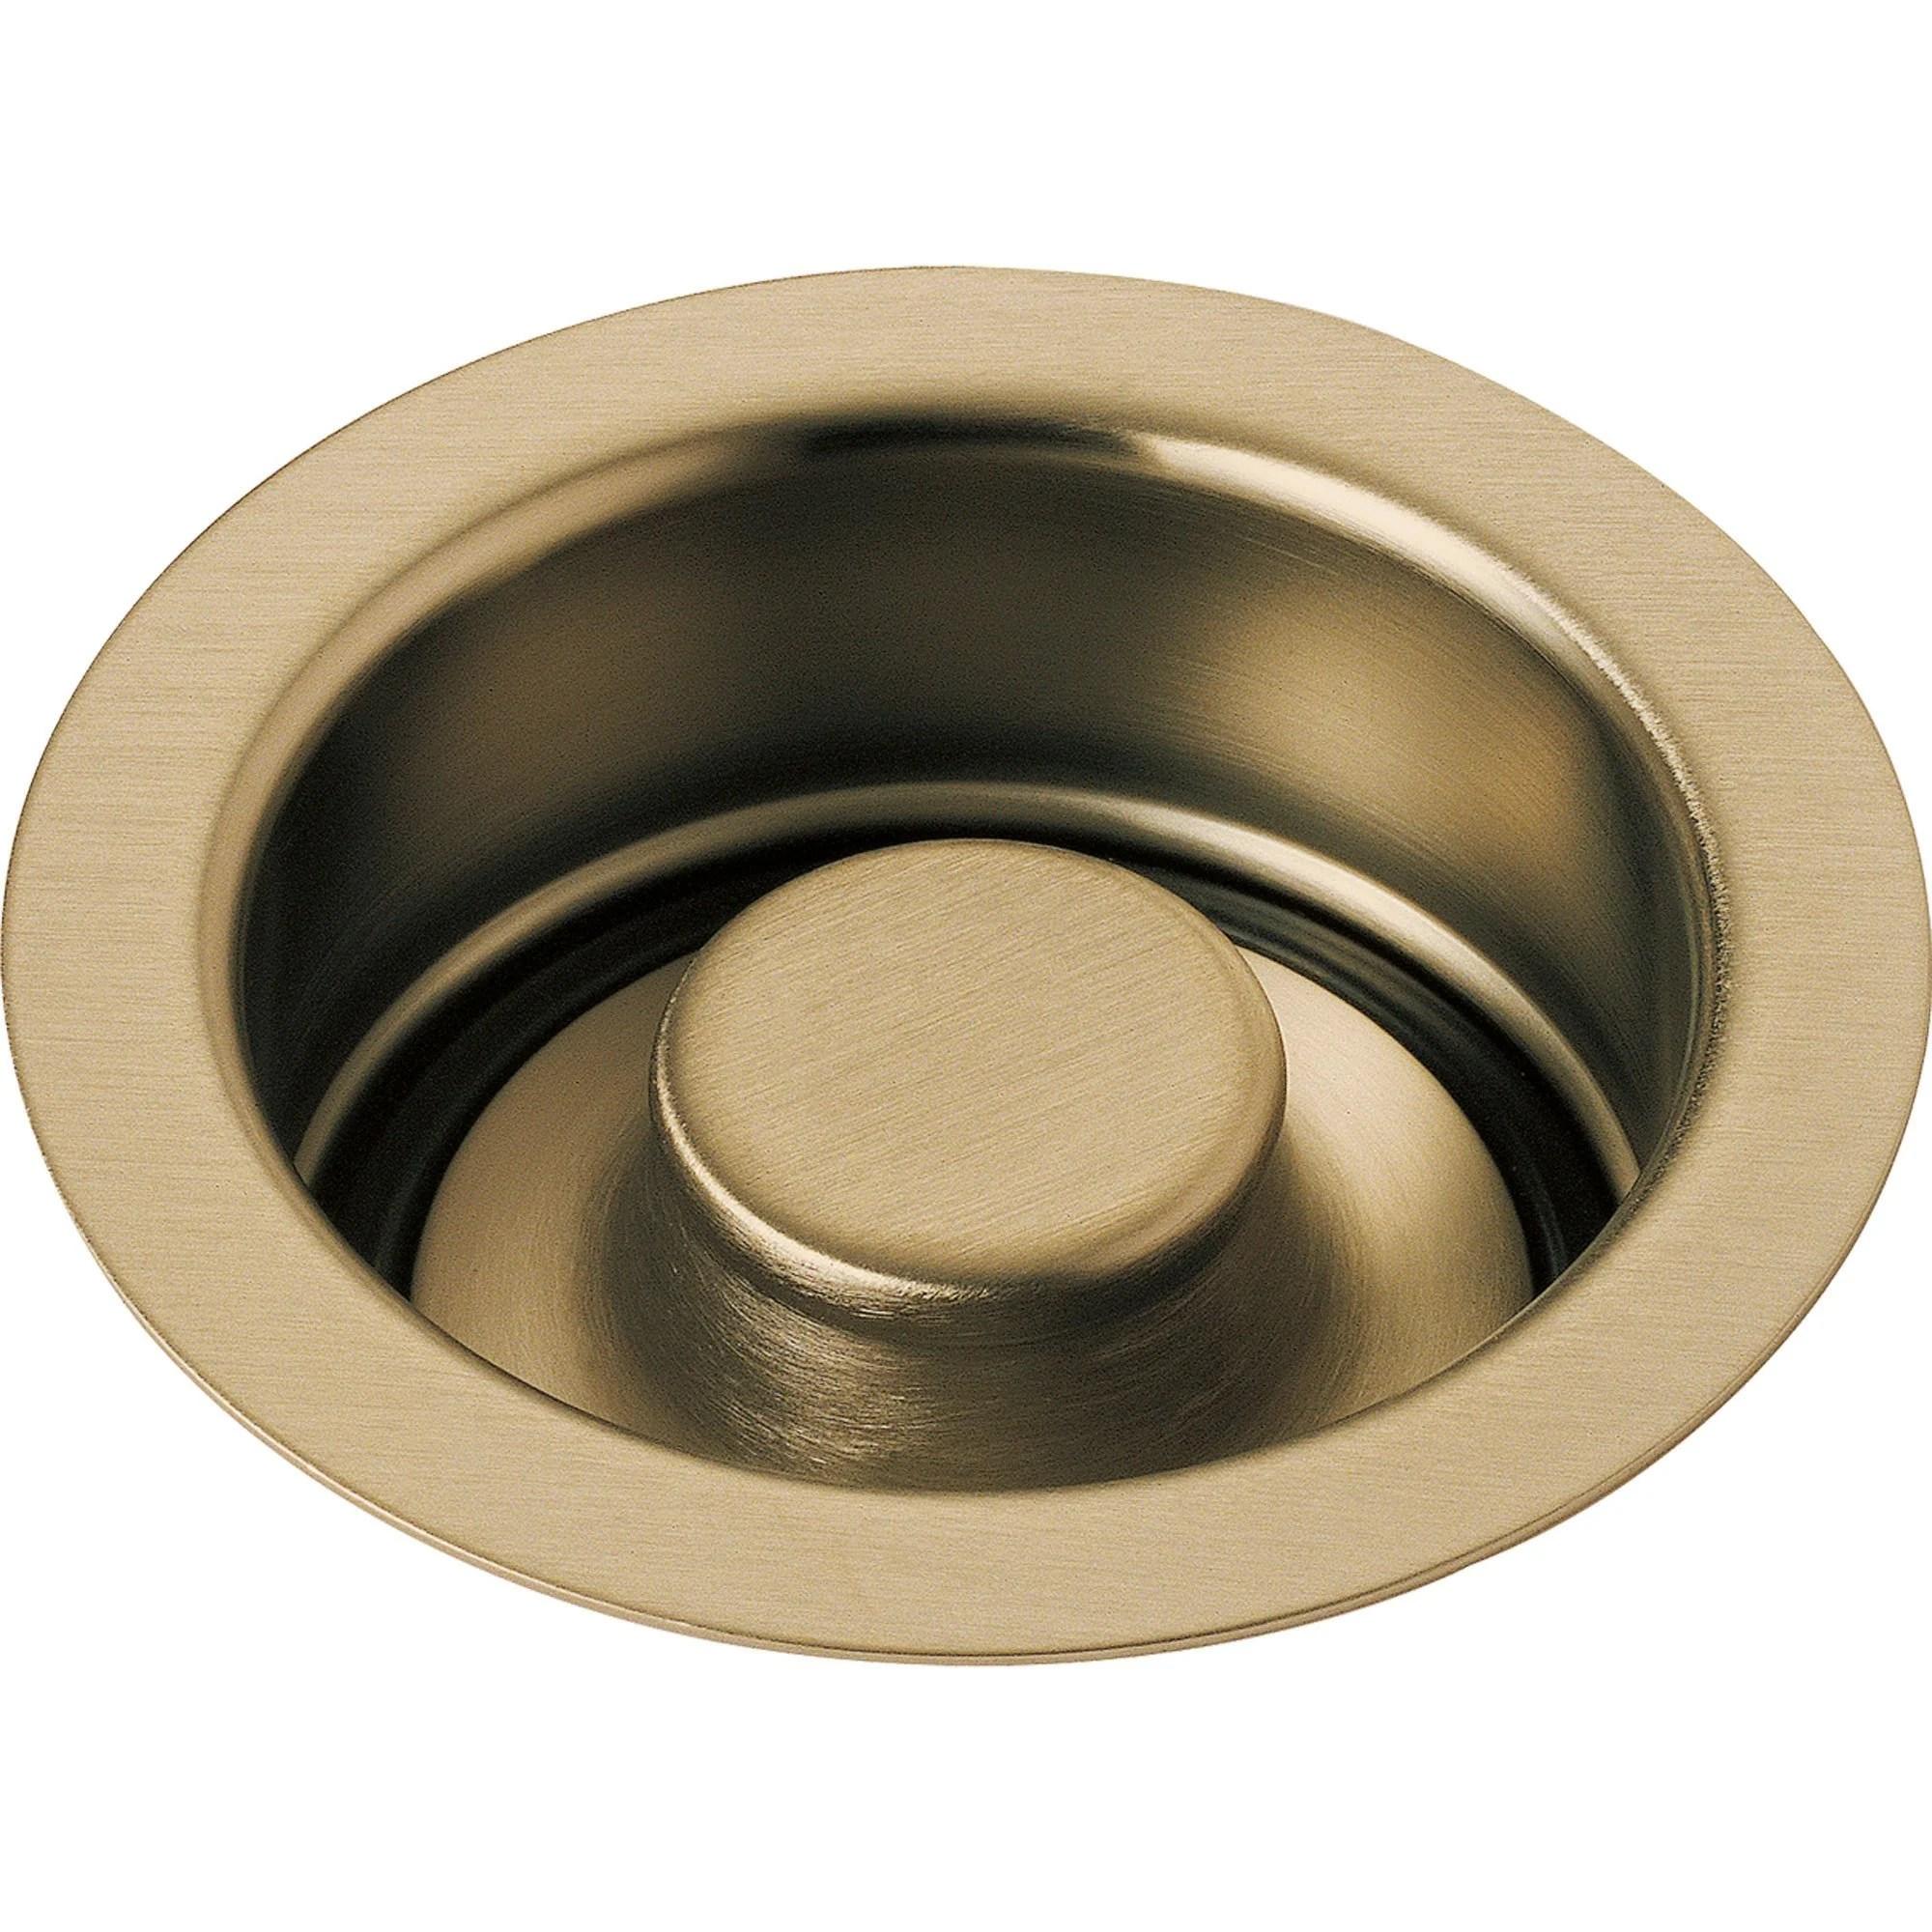 delta 4 1 2 champagne bronze kitchen sink disposal flange and stopper 638411